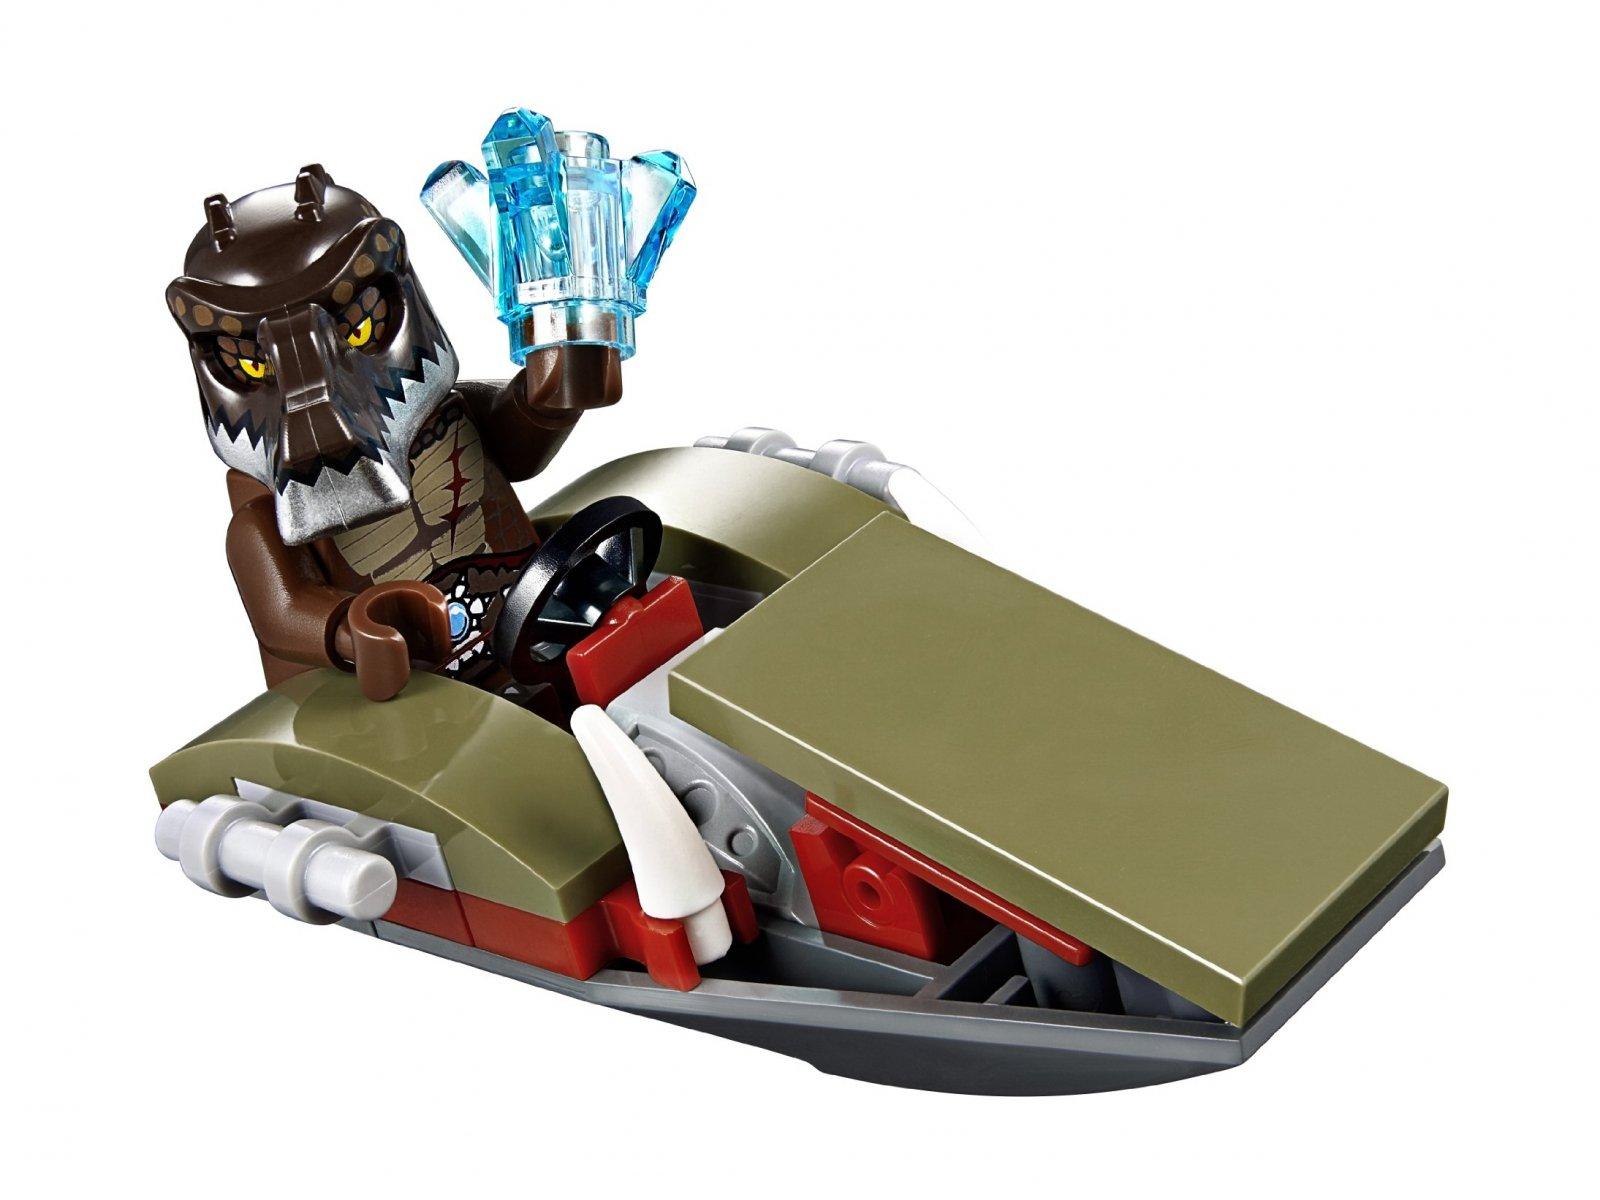 LEGO 30252 Legends of Chima™ Crug's Swamp Jet